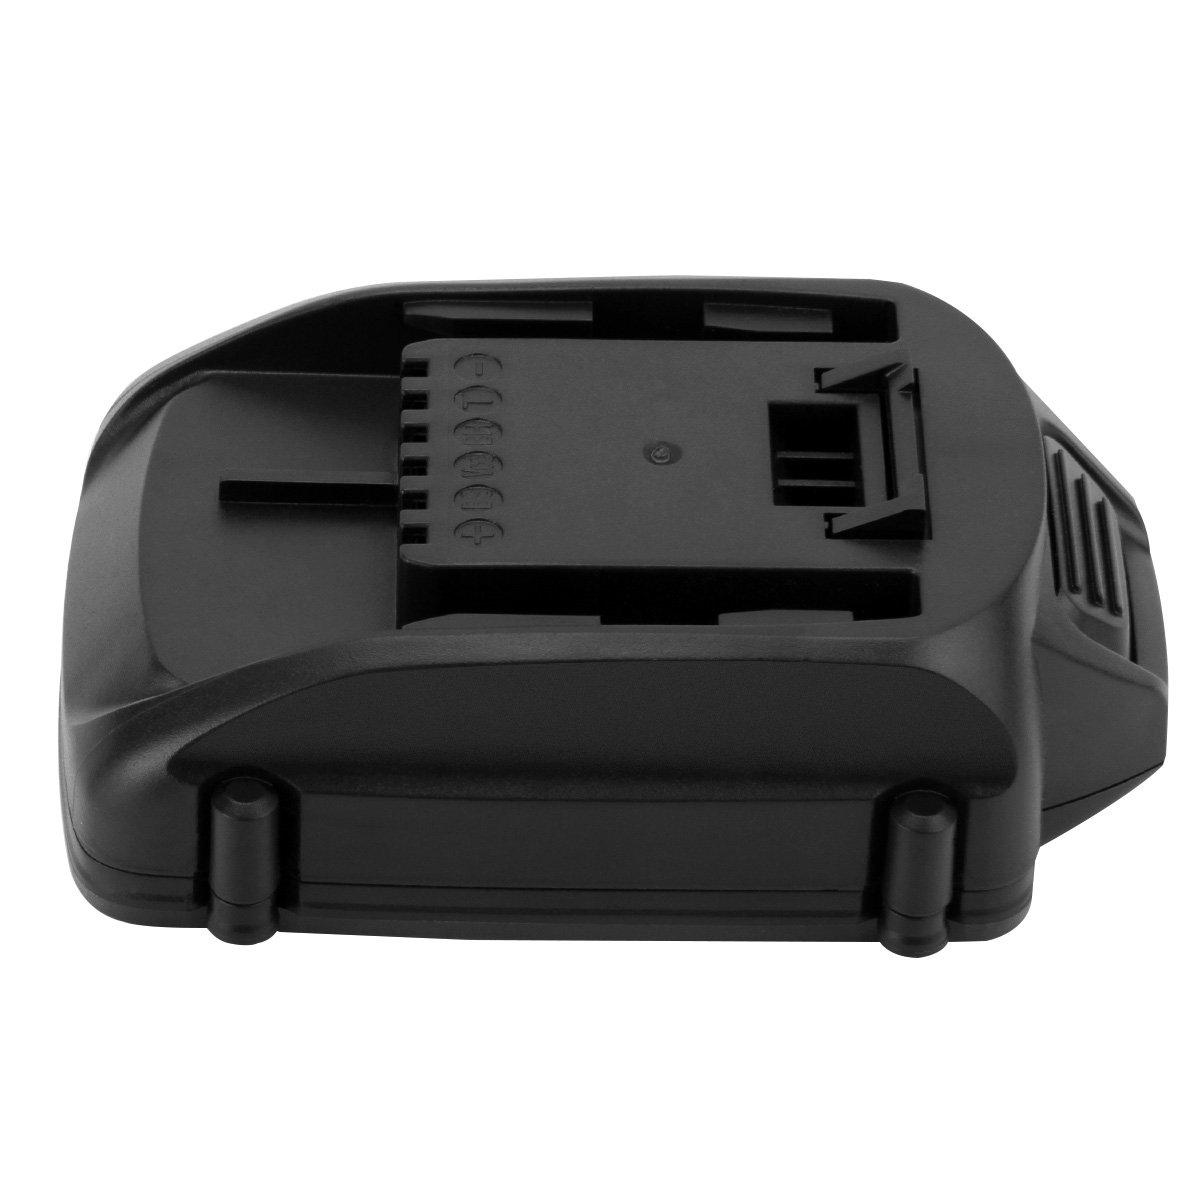 Shentec 18V Replacement Battery for Worx WA3512, 3000mAh Li-ion Battery  Pack - - Amazon.com